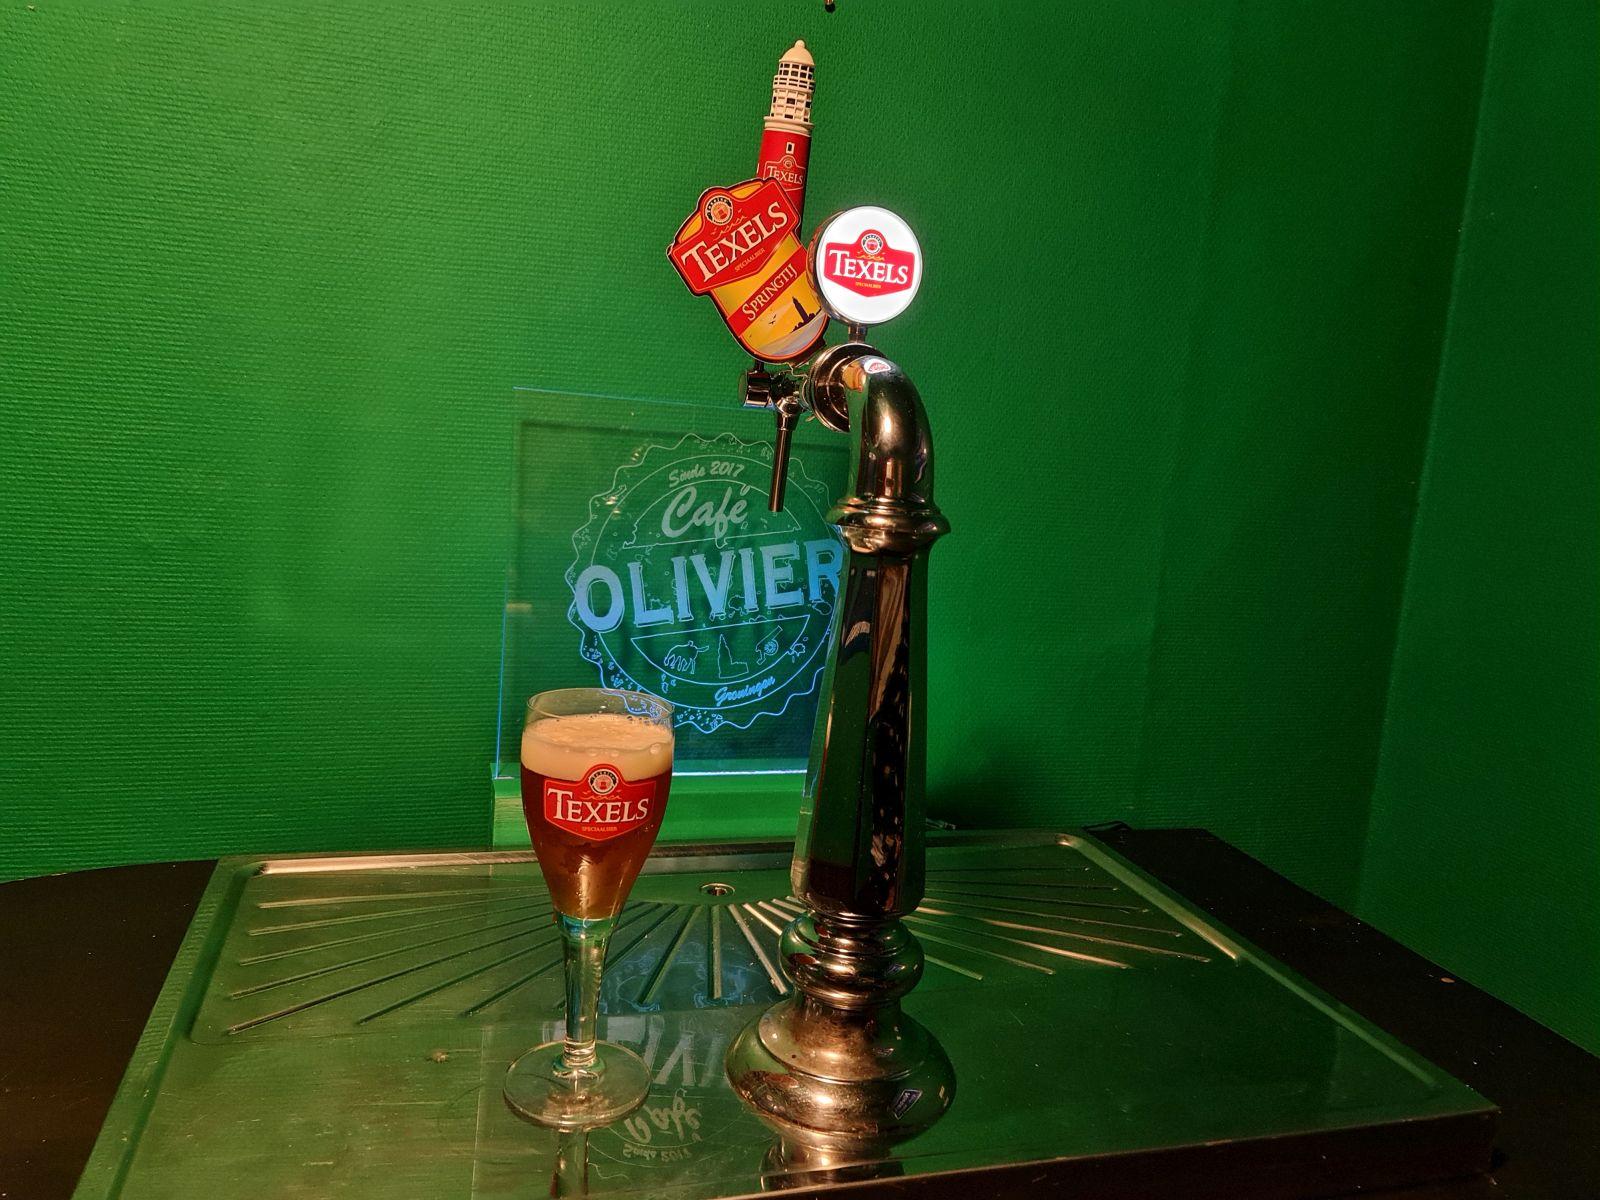 Texels Springtij - Café Olivier